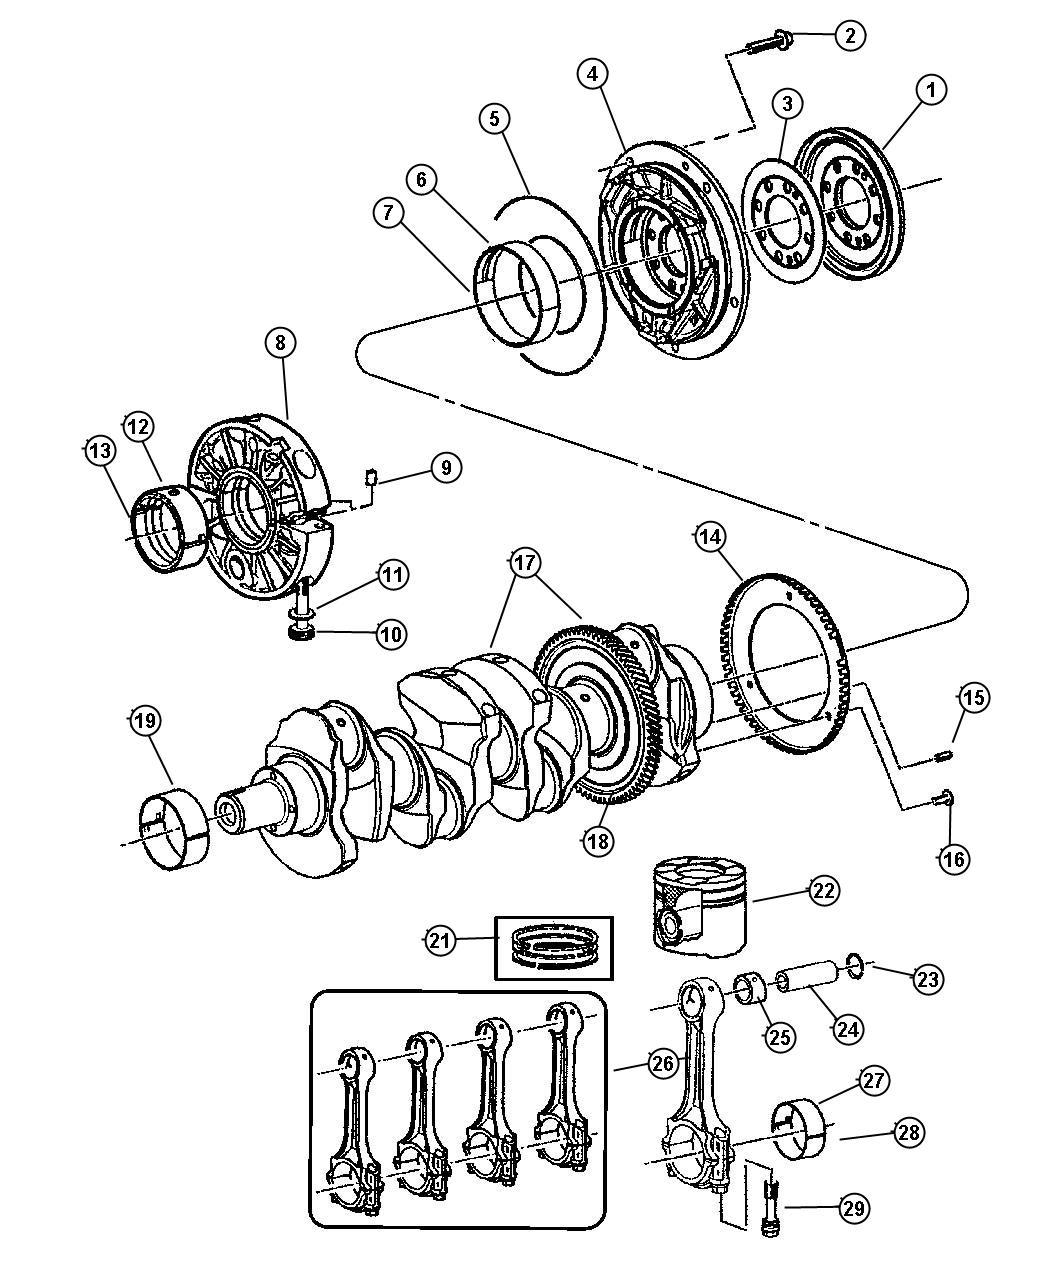 Liberty Crankshaft,Pistons and Related, 2.8L Diesel [2.8L